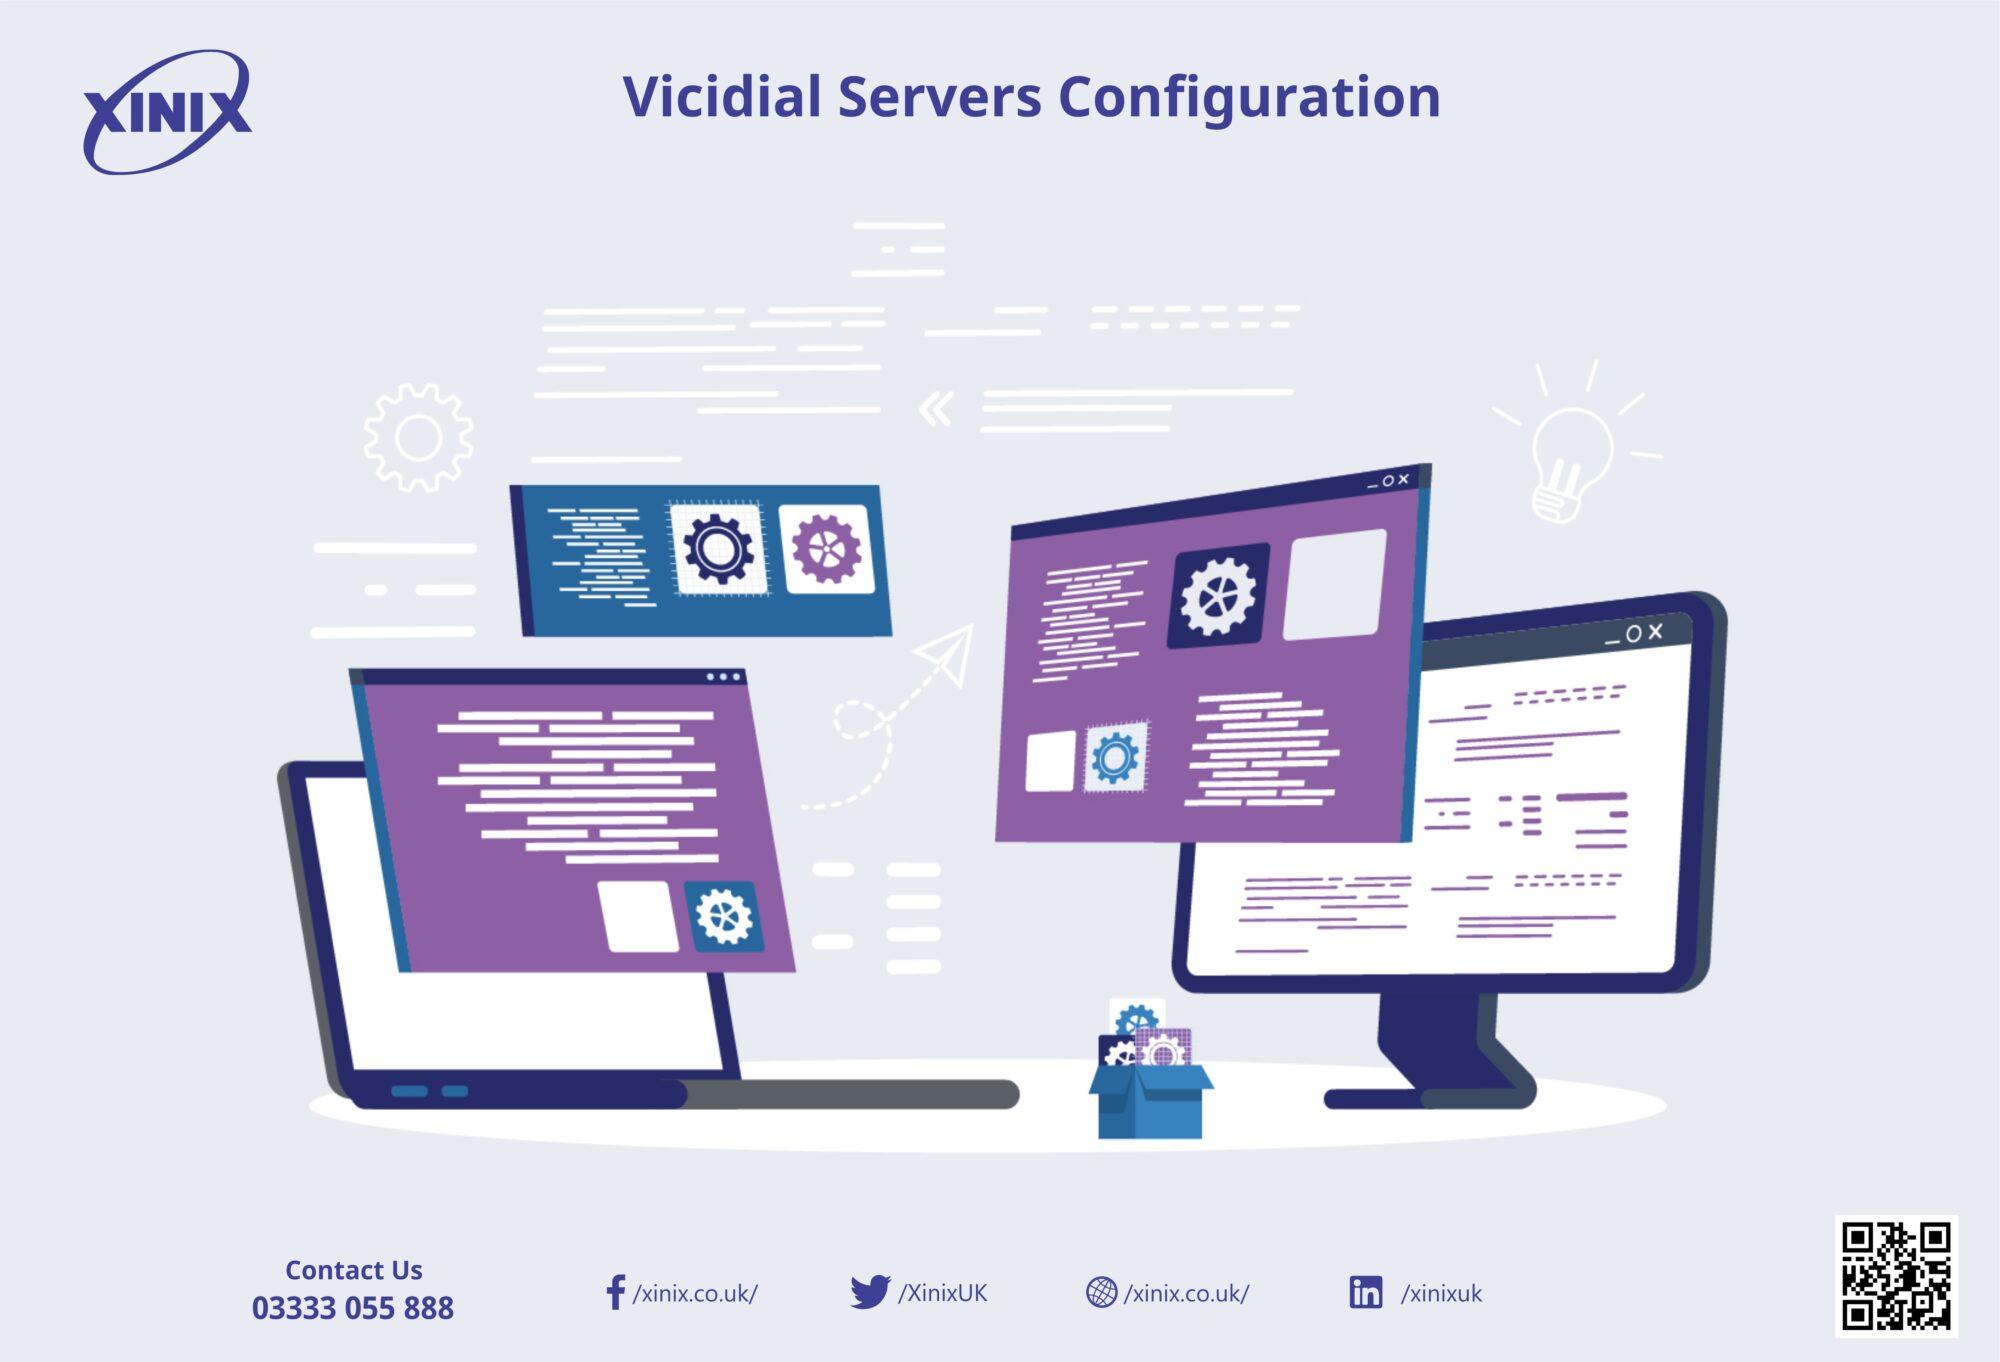 Vicidial Servers Configuration